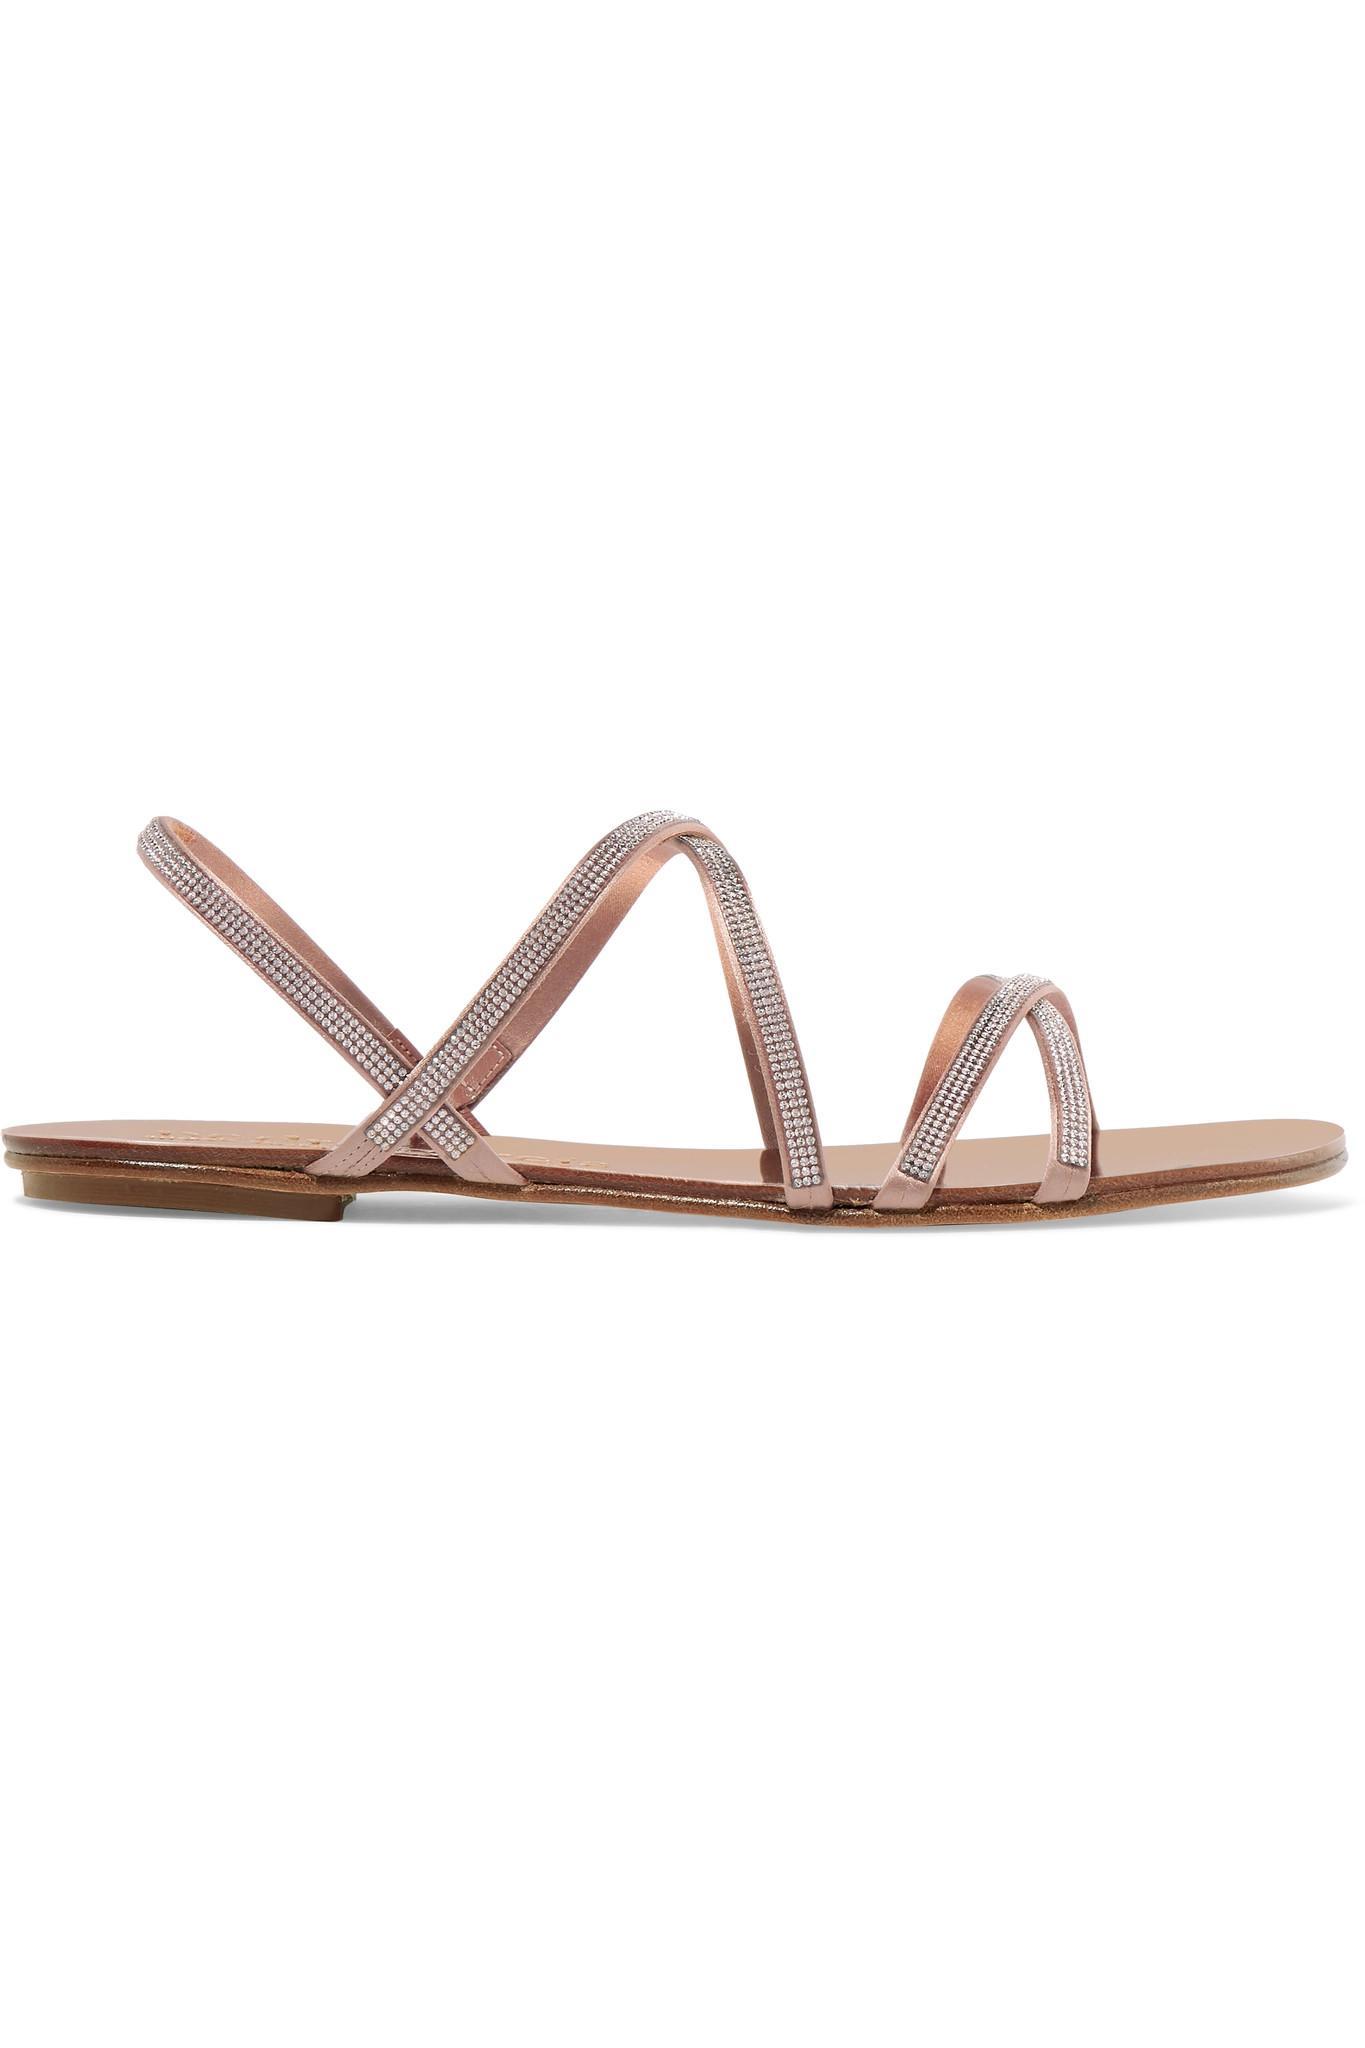 0ffe84ddb334a Pedro Garcia. Women s Natural Sarabel Swarovski Crystal-embellished Satin  Sandals